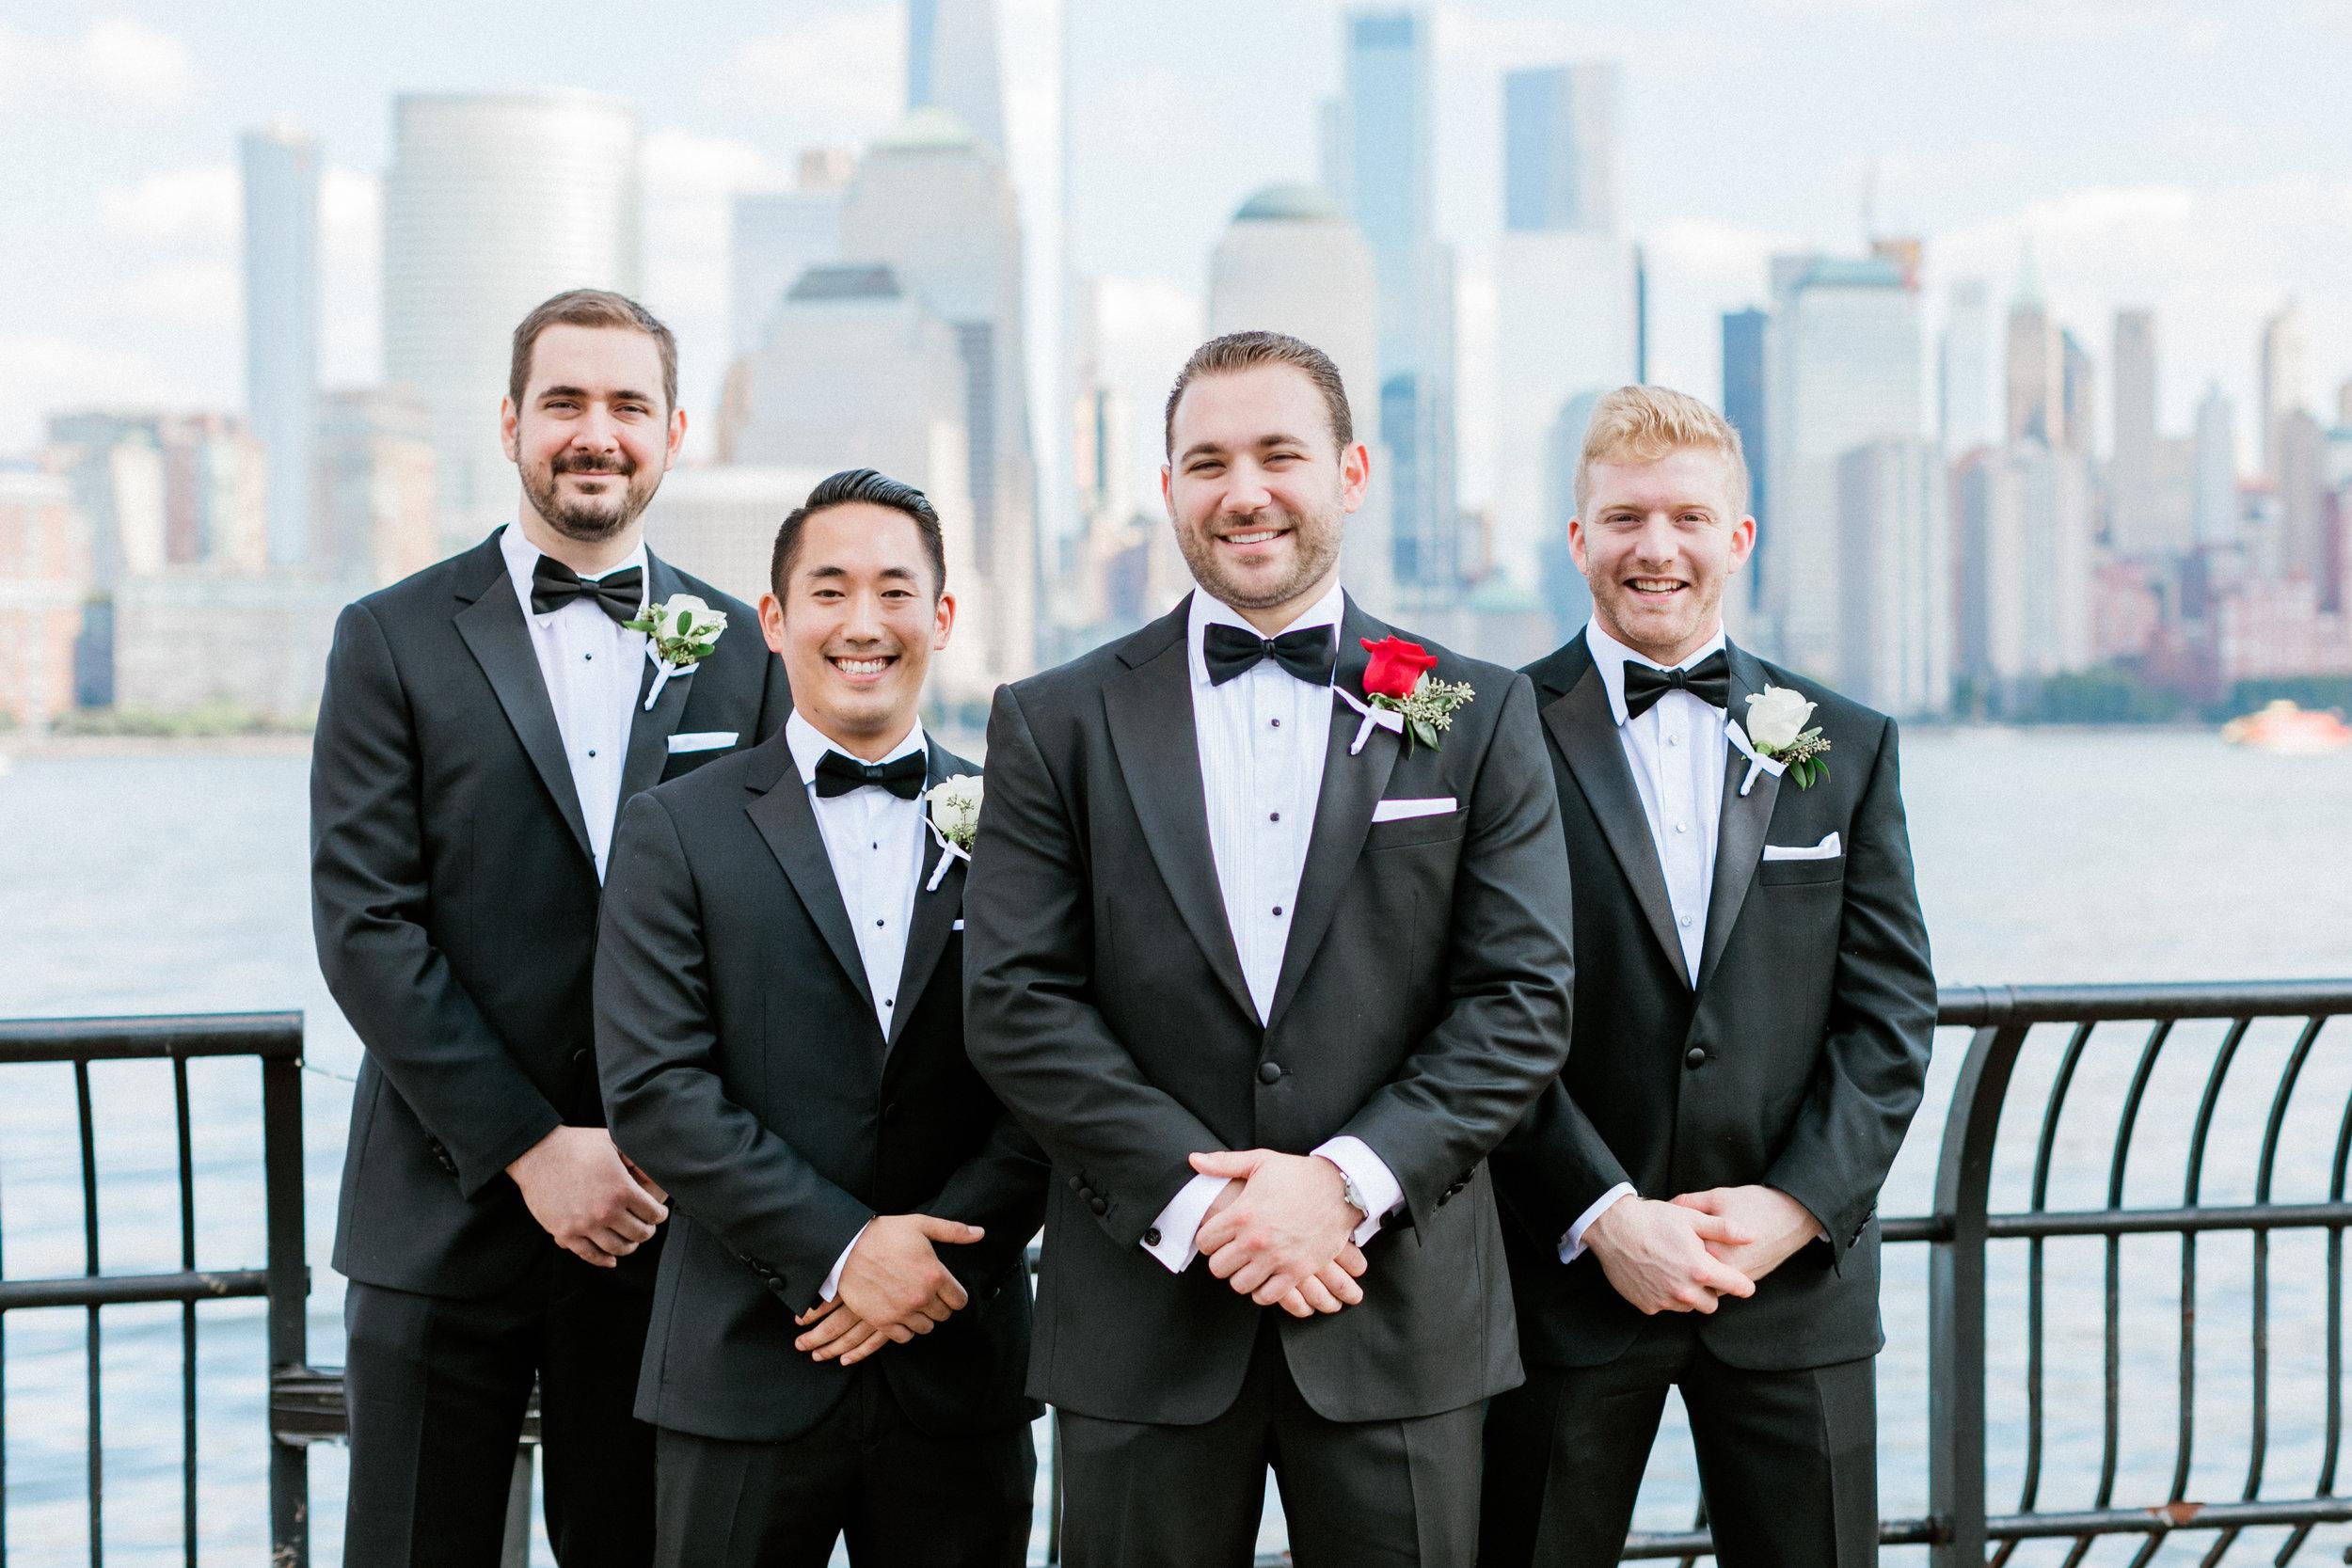 hyatt-regency-jersey-city-wedding-photographer27.jpg